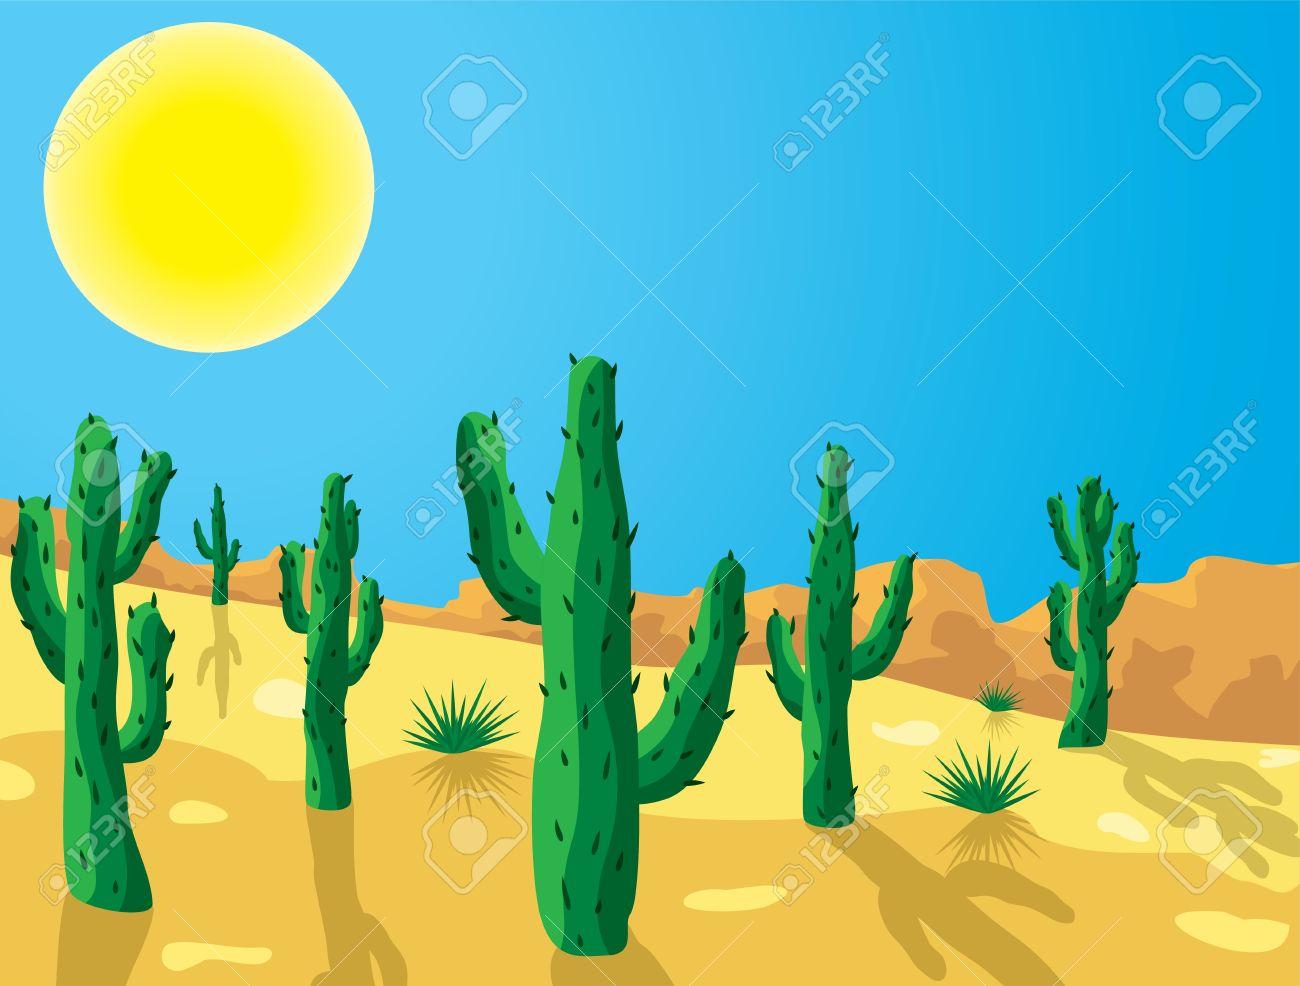 Desert clipart #12, Download drawings